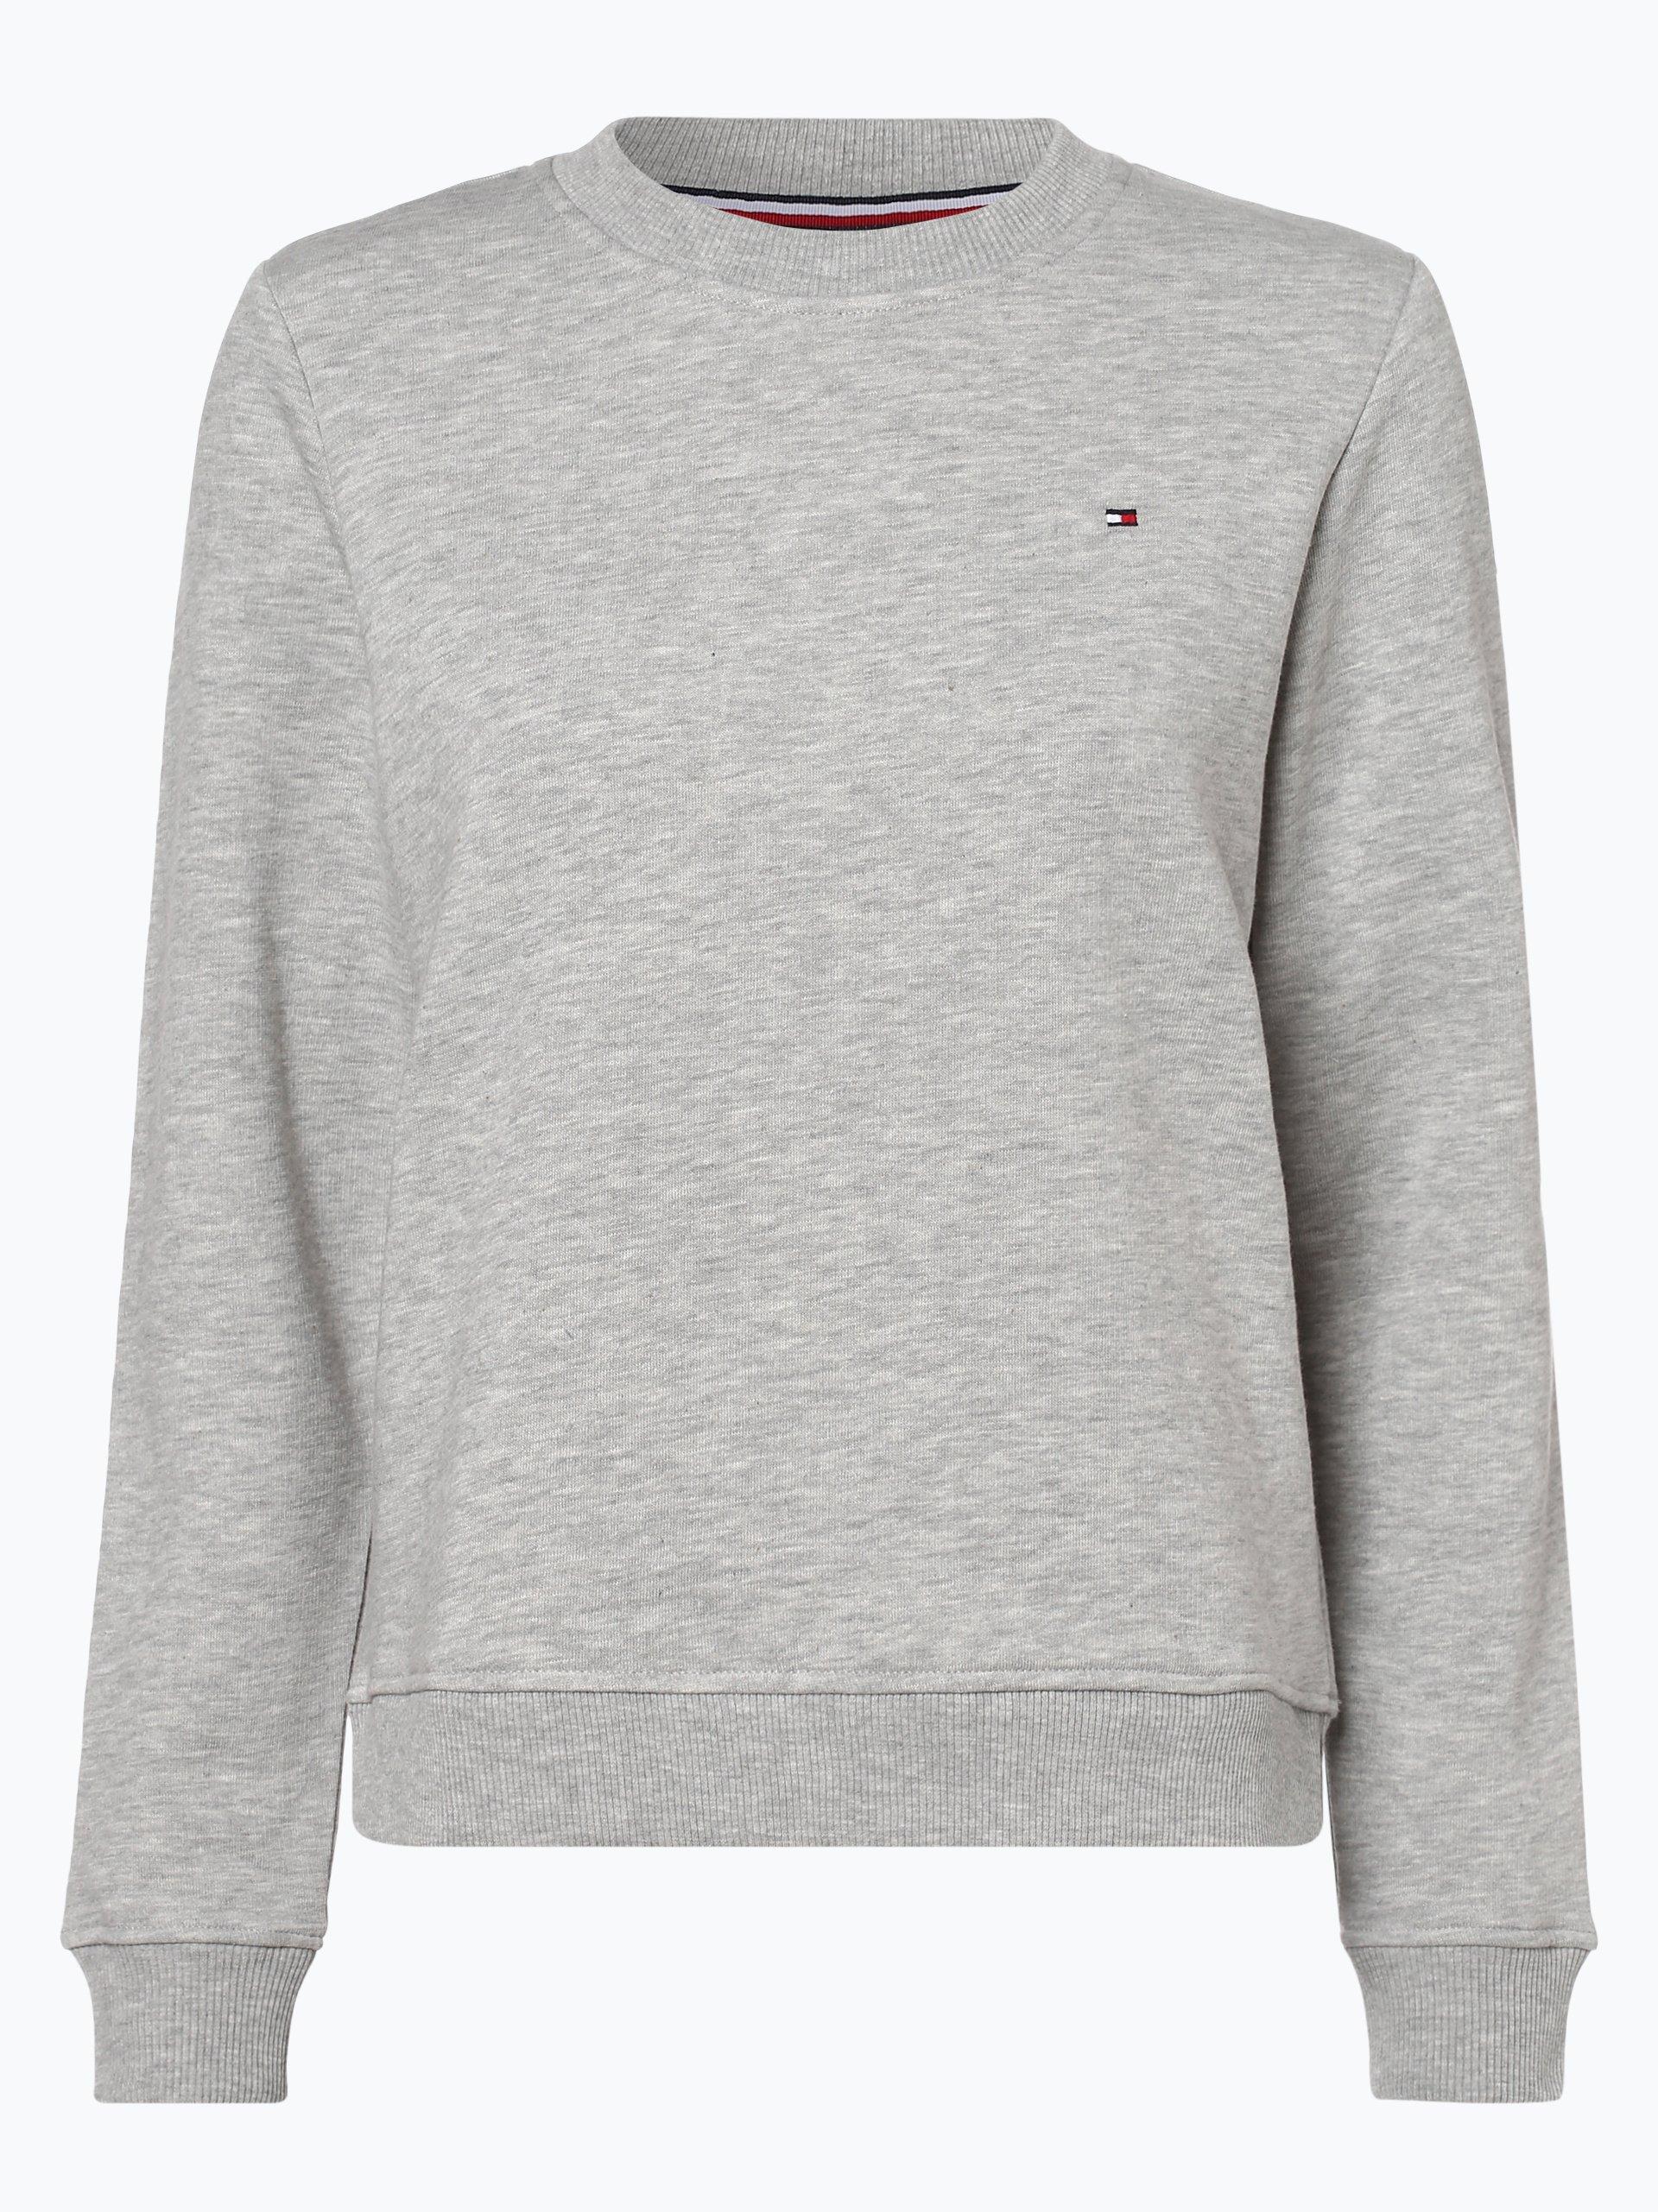 Tommy Hilfiger Damen Sweatshirt - Louisa